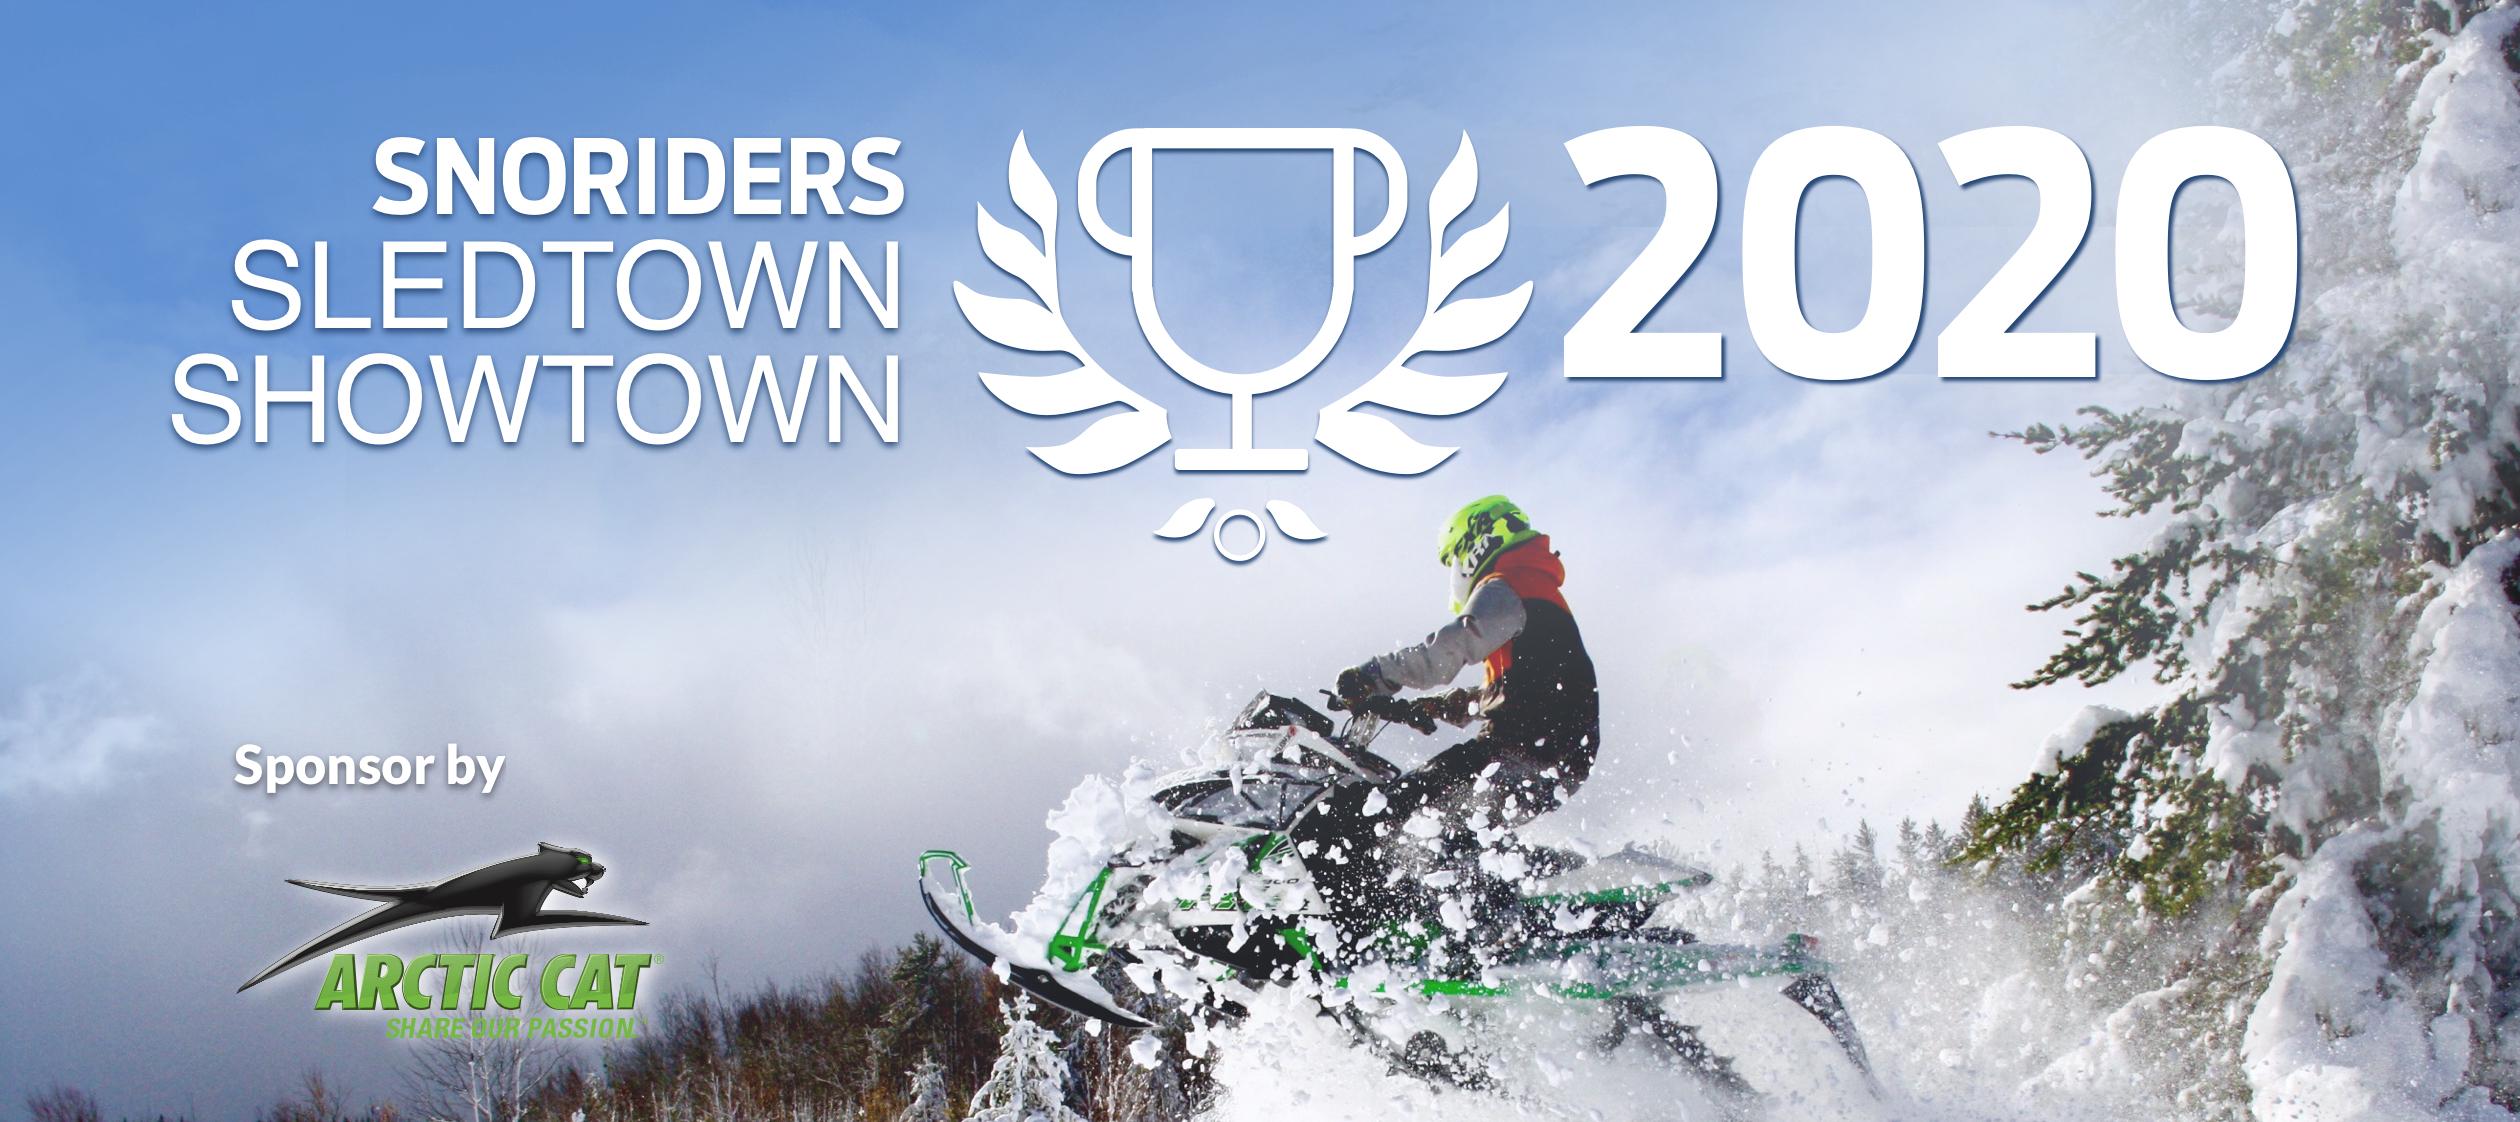 Snowmobile jumping into 2020 sledtown showdown logo